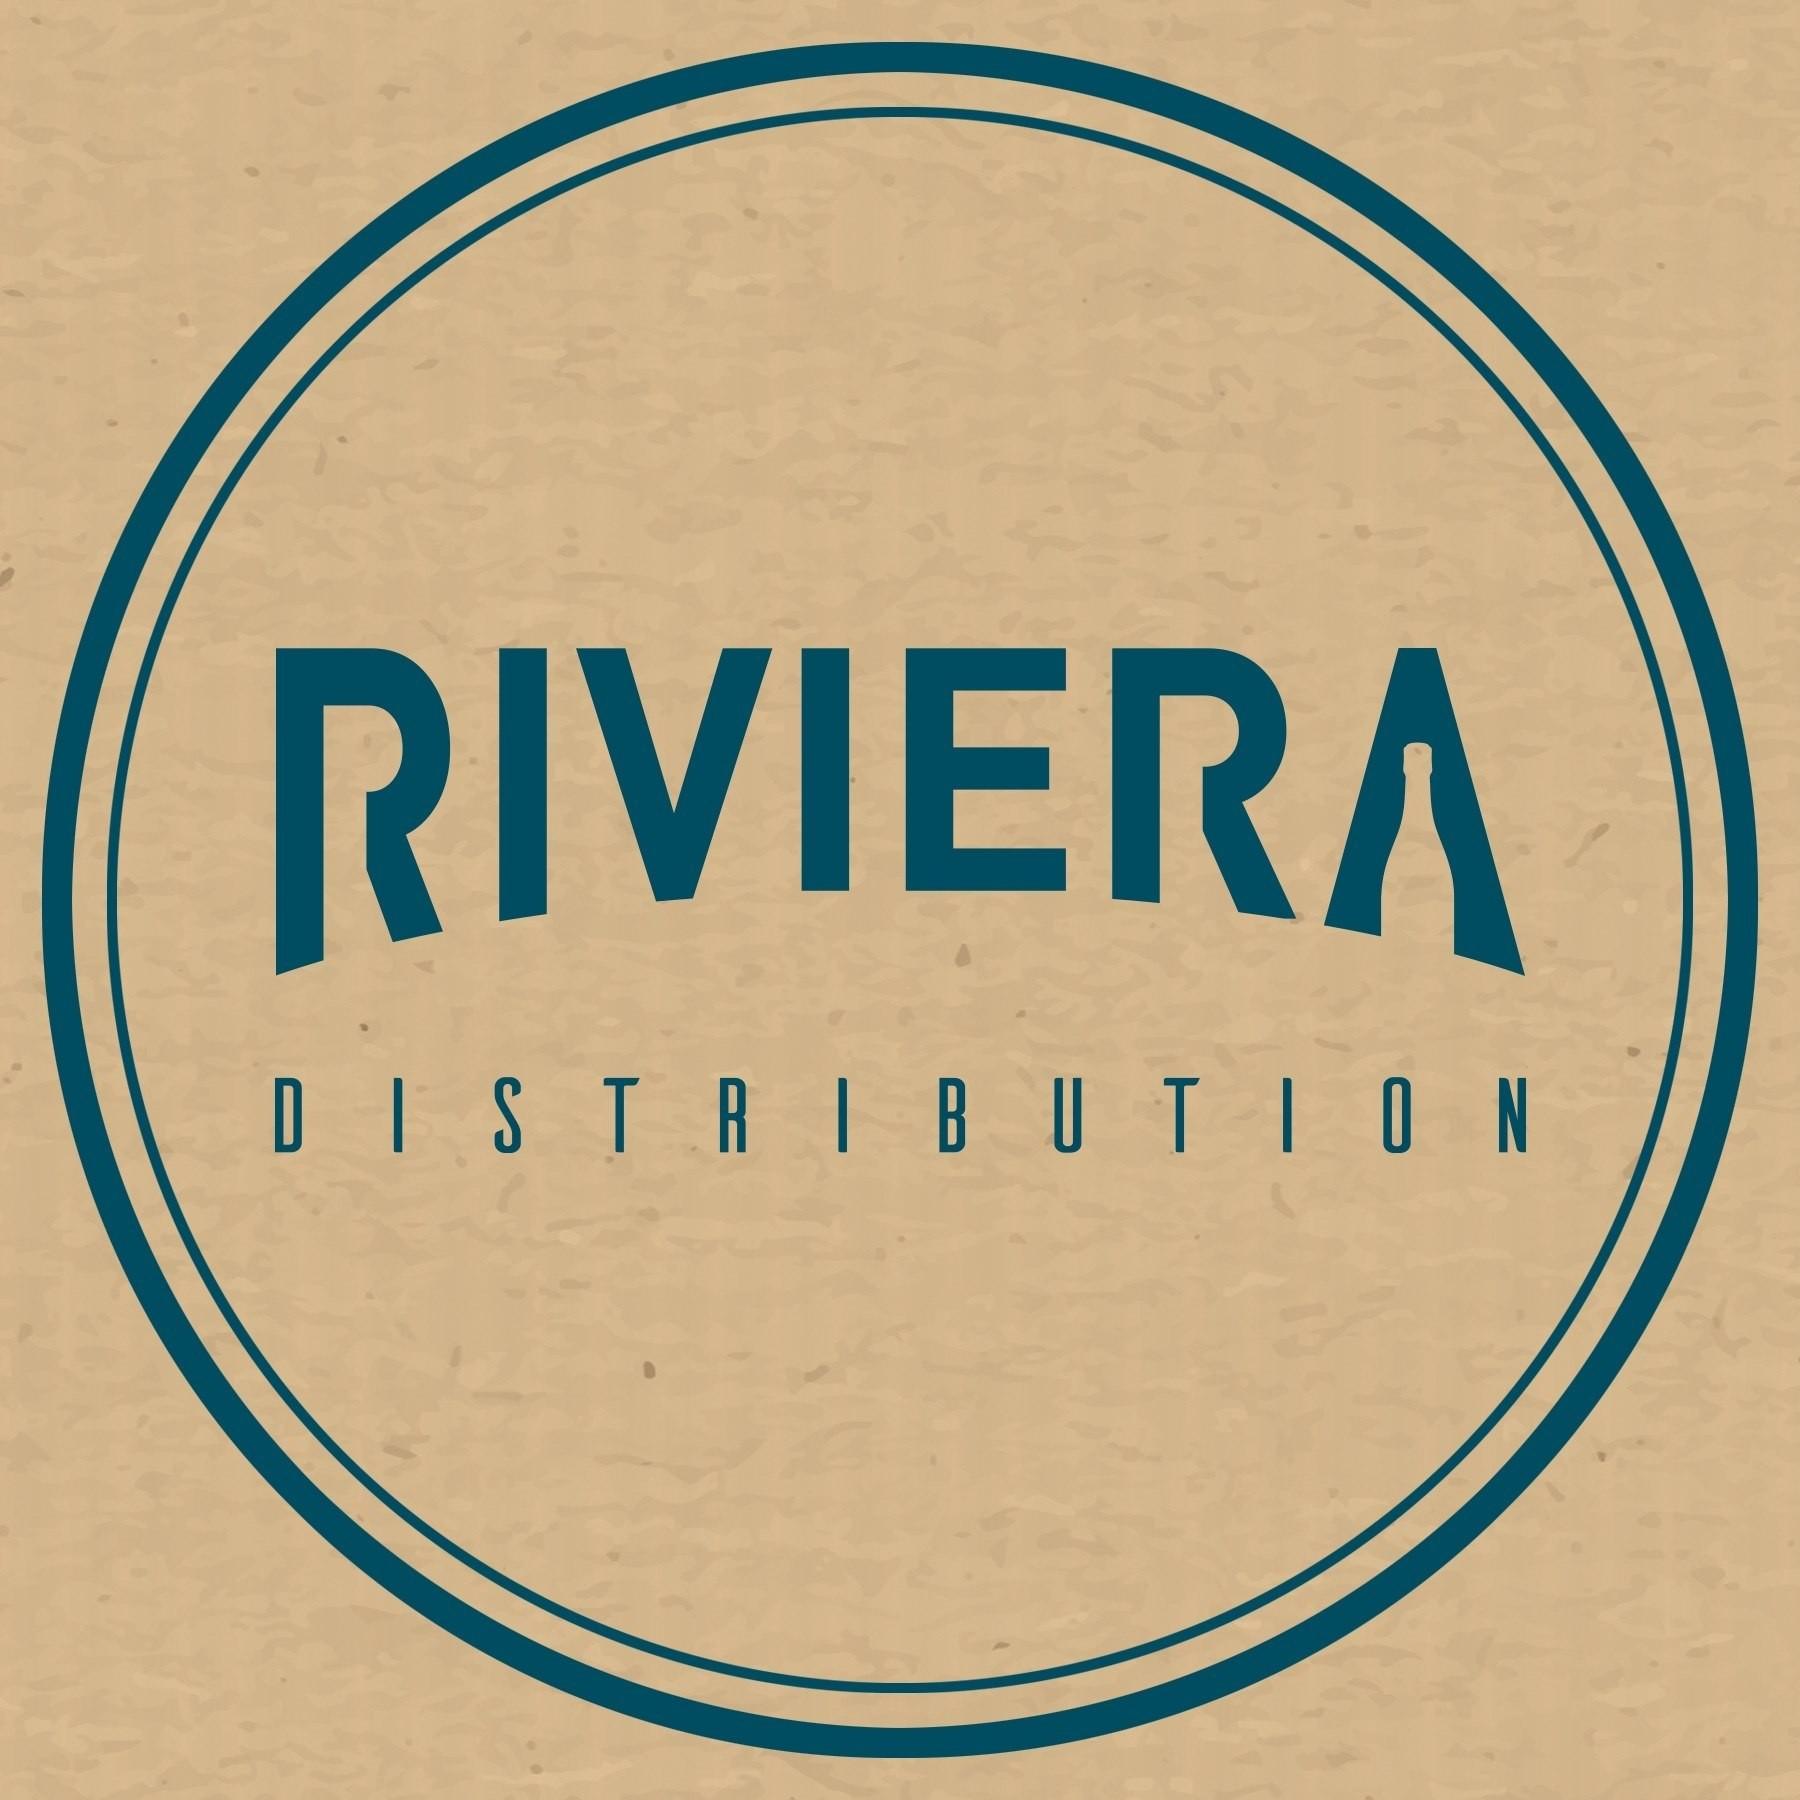 RIVIERA DISTRIBUTION